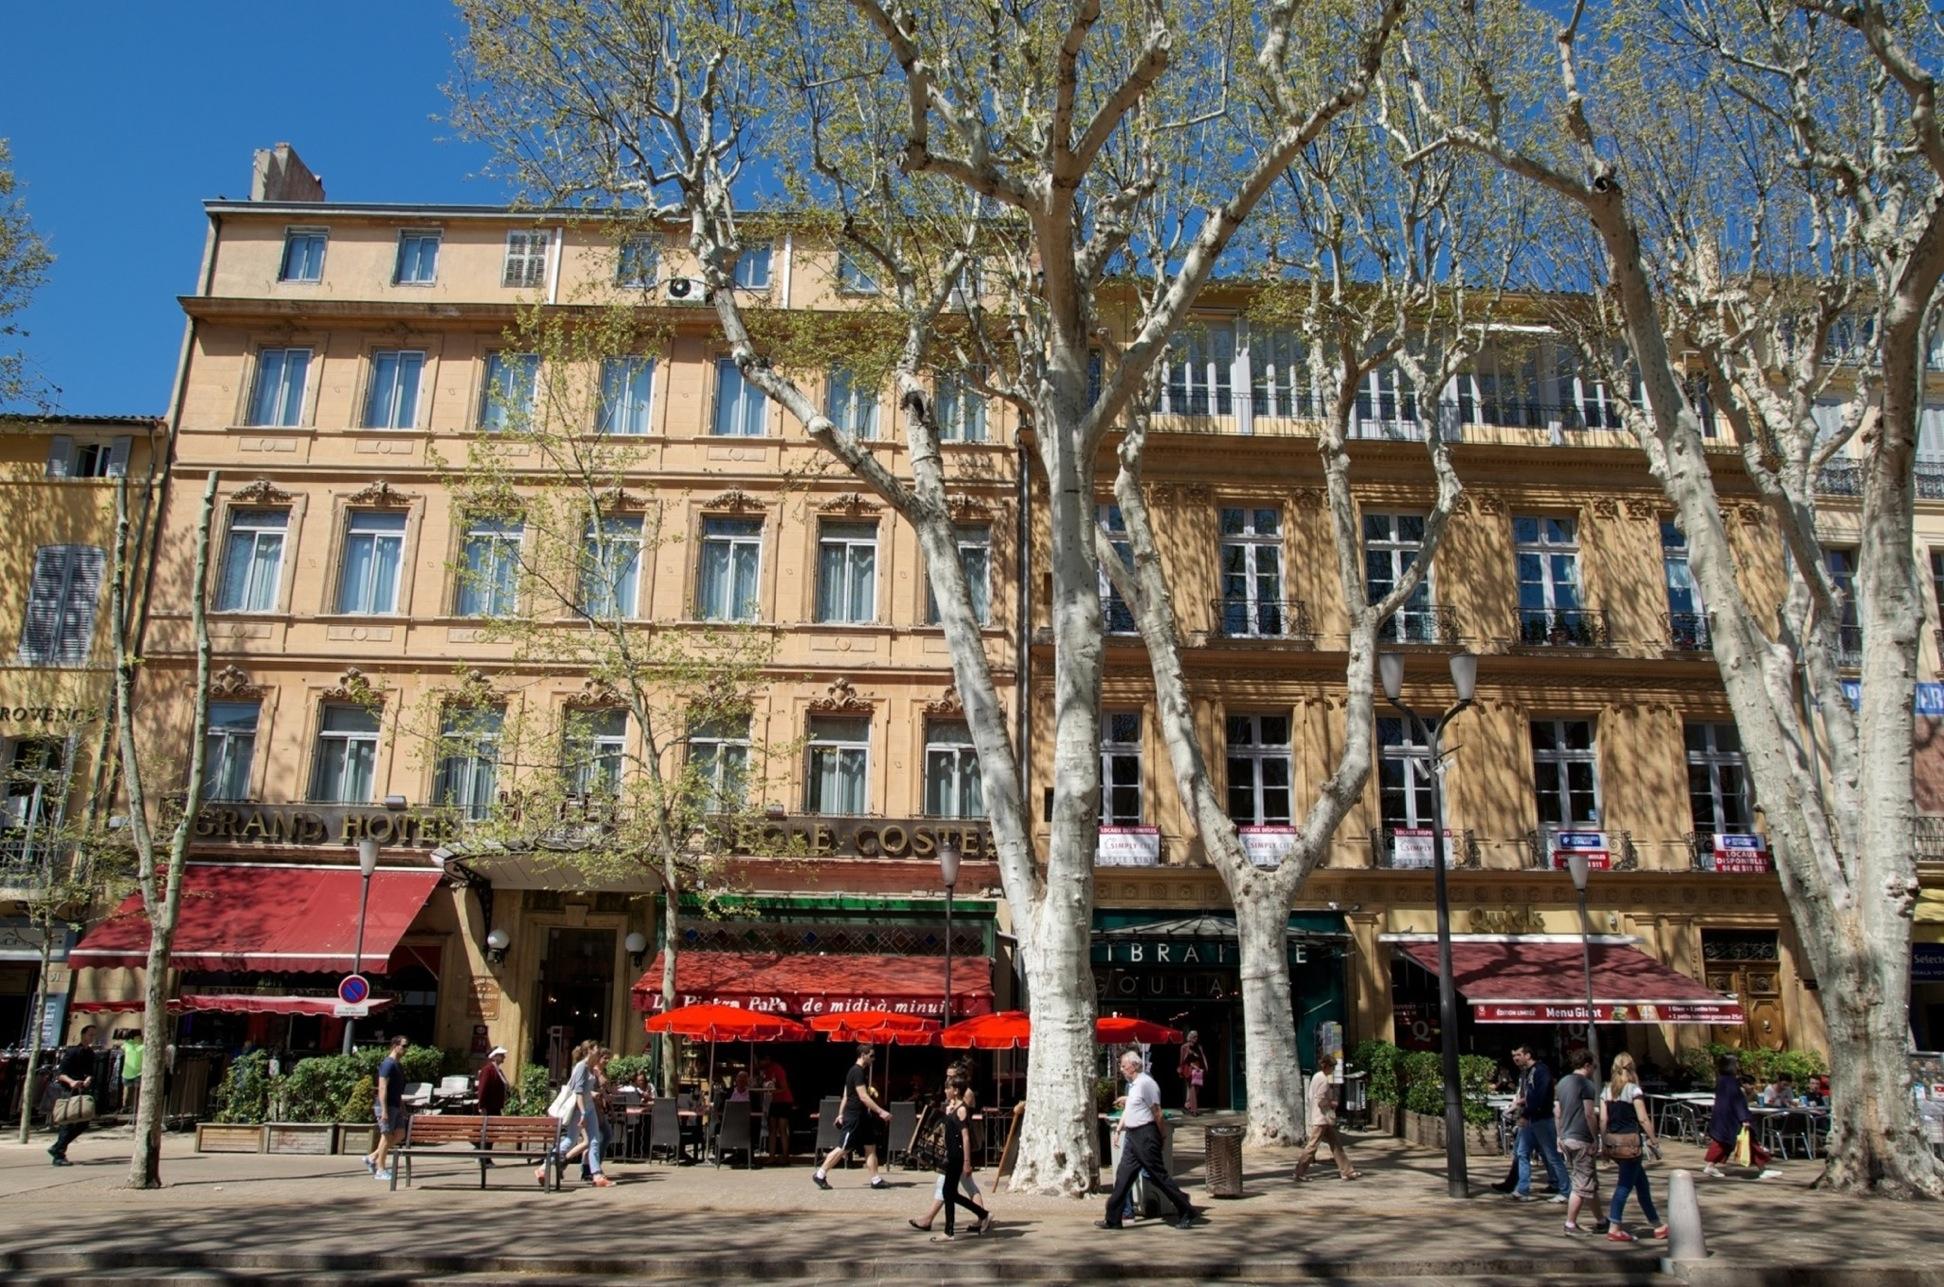 Marseille and Aix-en-Provence - Savannah Page 8